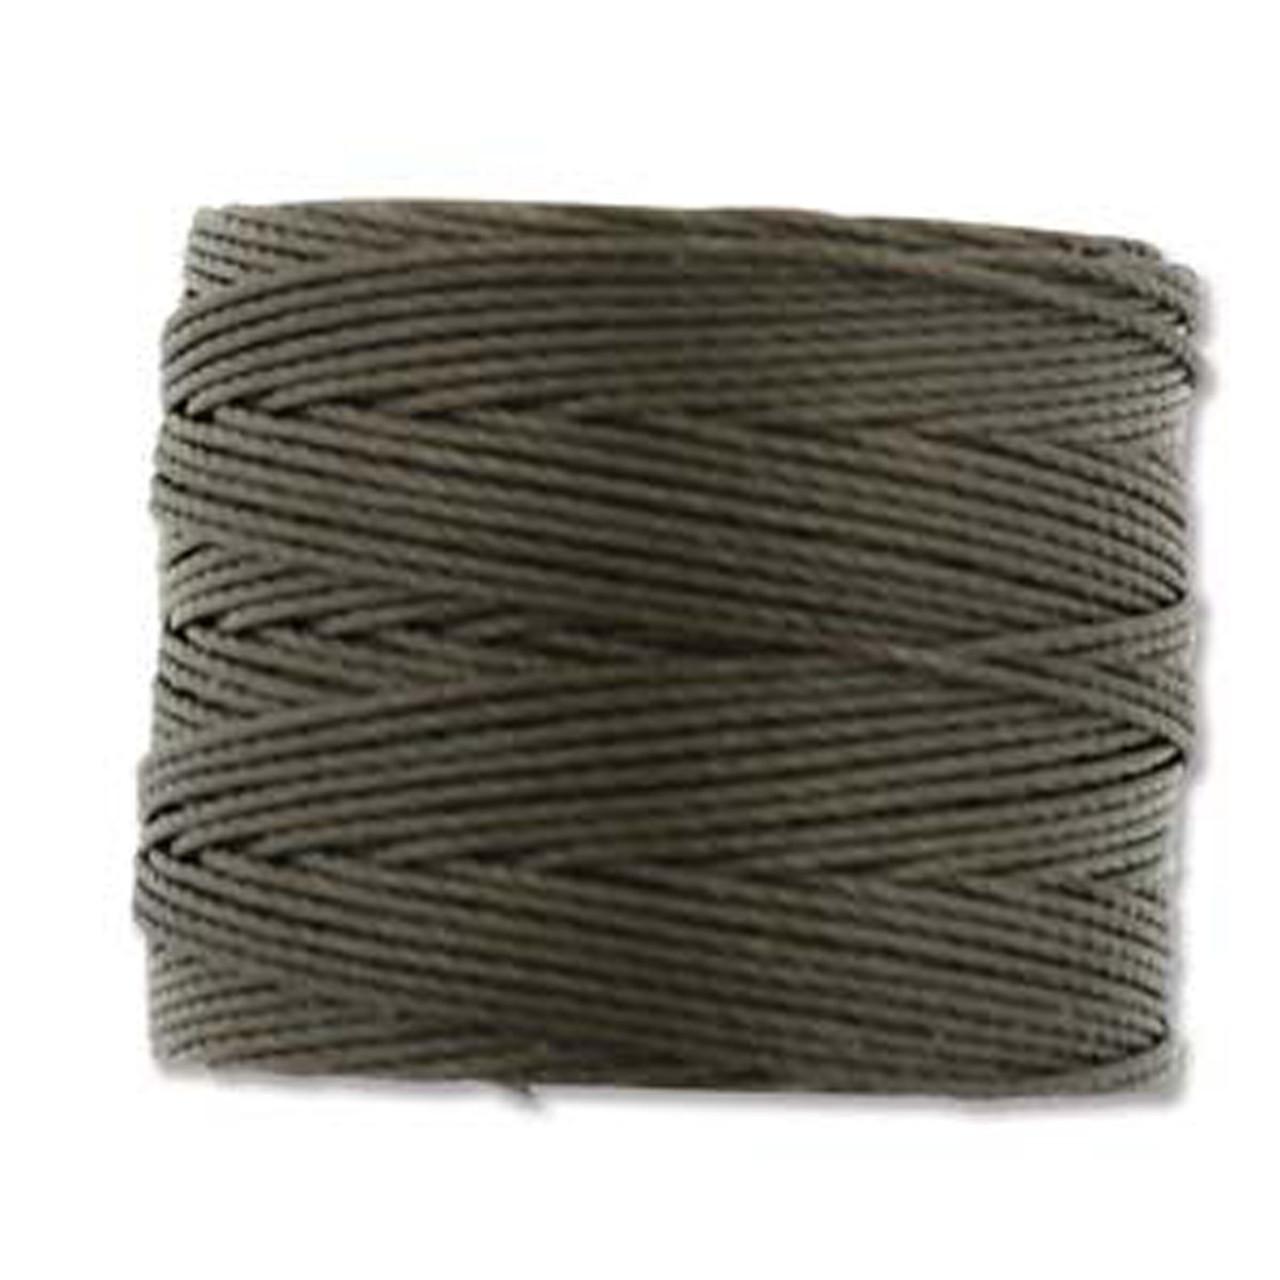 Size #18 Twisted Nylon 77 Yard Spool S-Lon Super-Lon Cord Dark Red